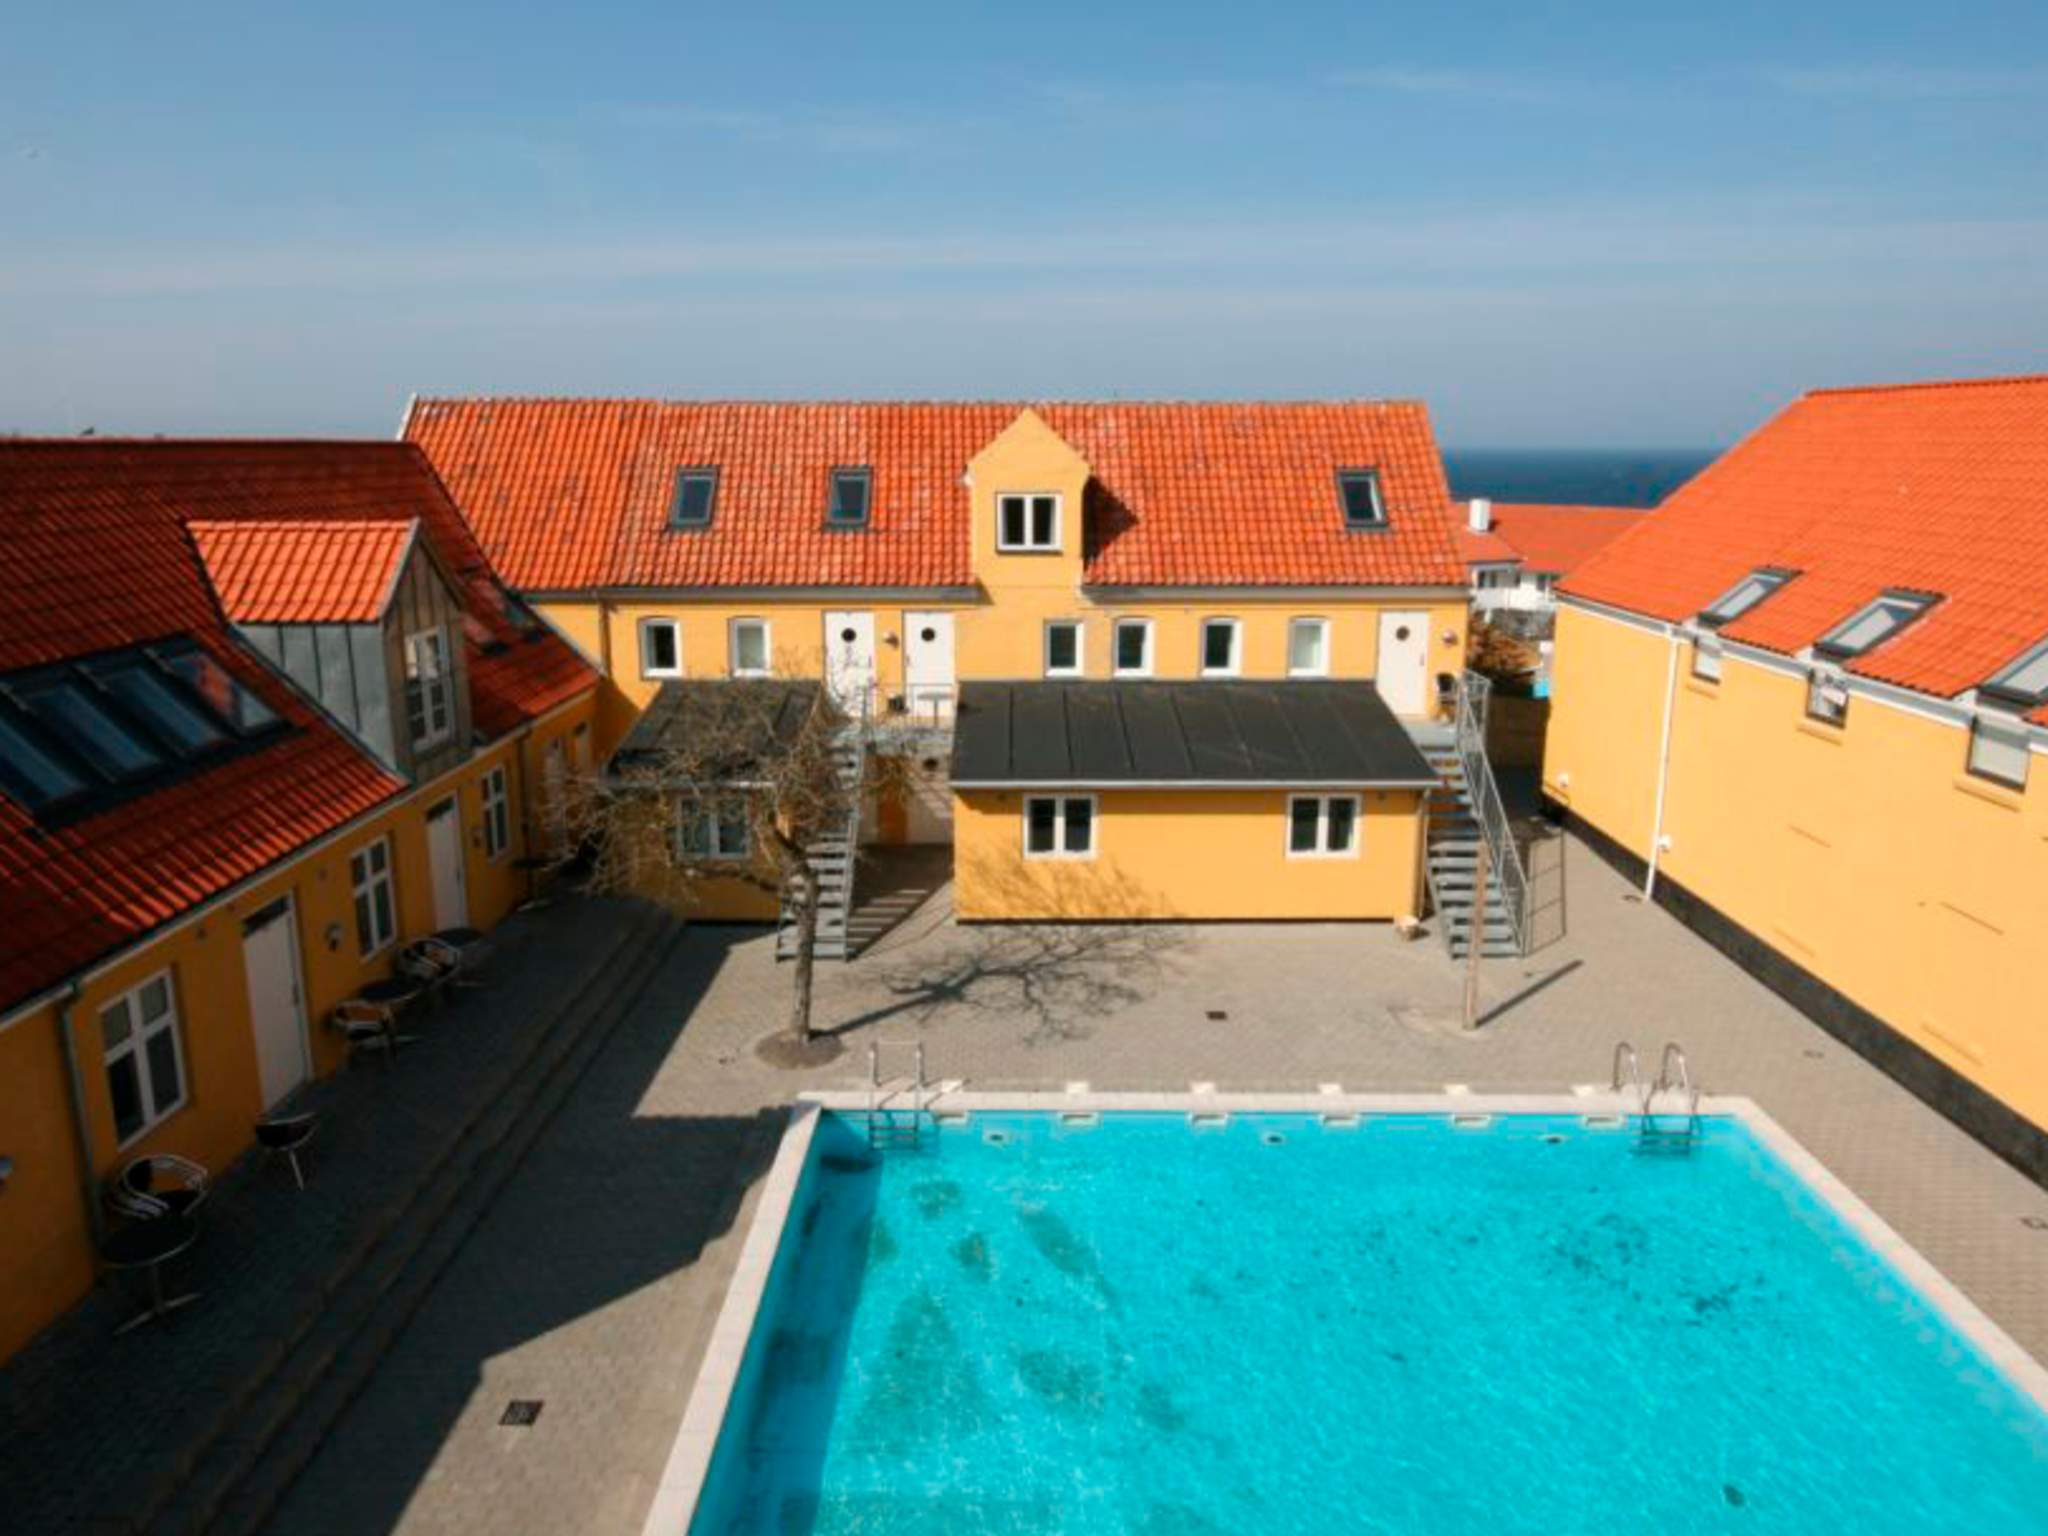 Ferienwohnung Gudhjem (135425), Gudhjem, , Bornholm, Dänemark, Bild 17